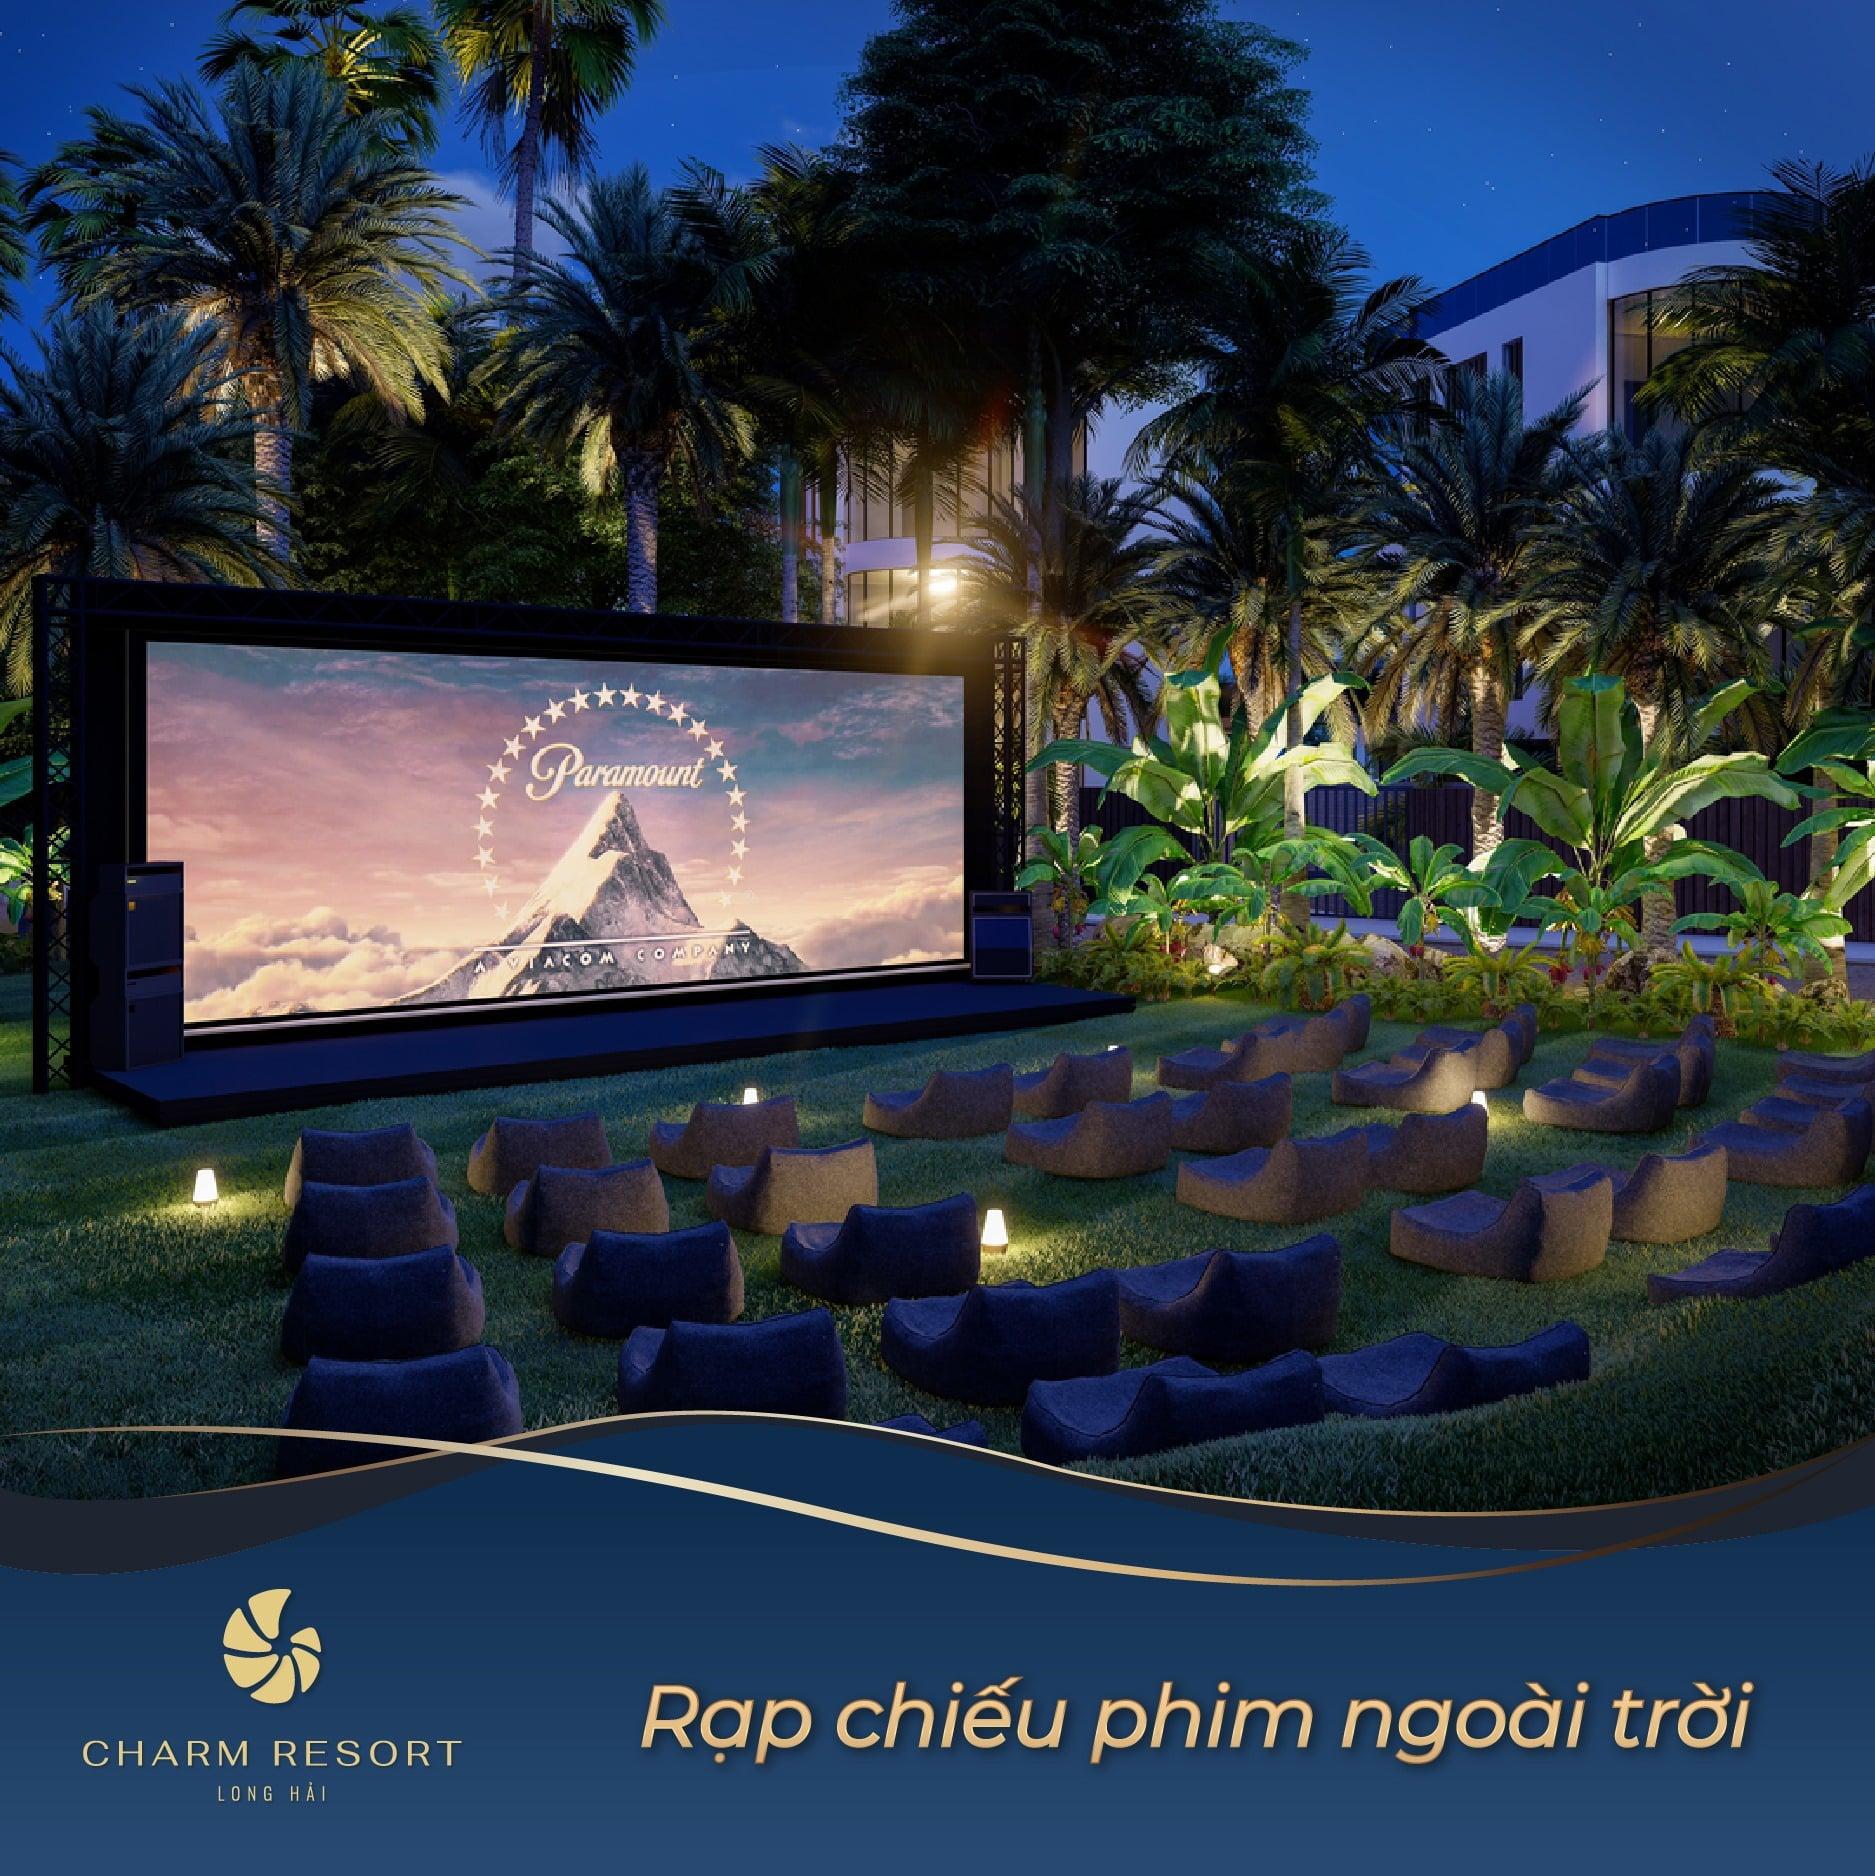 rap-chieu-phim-ngoai-troi-du-an-charm-resort-long-hai